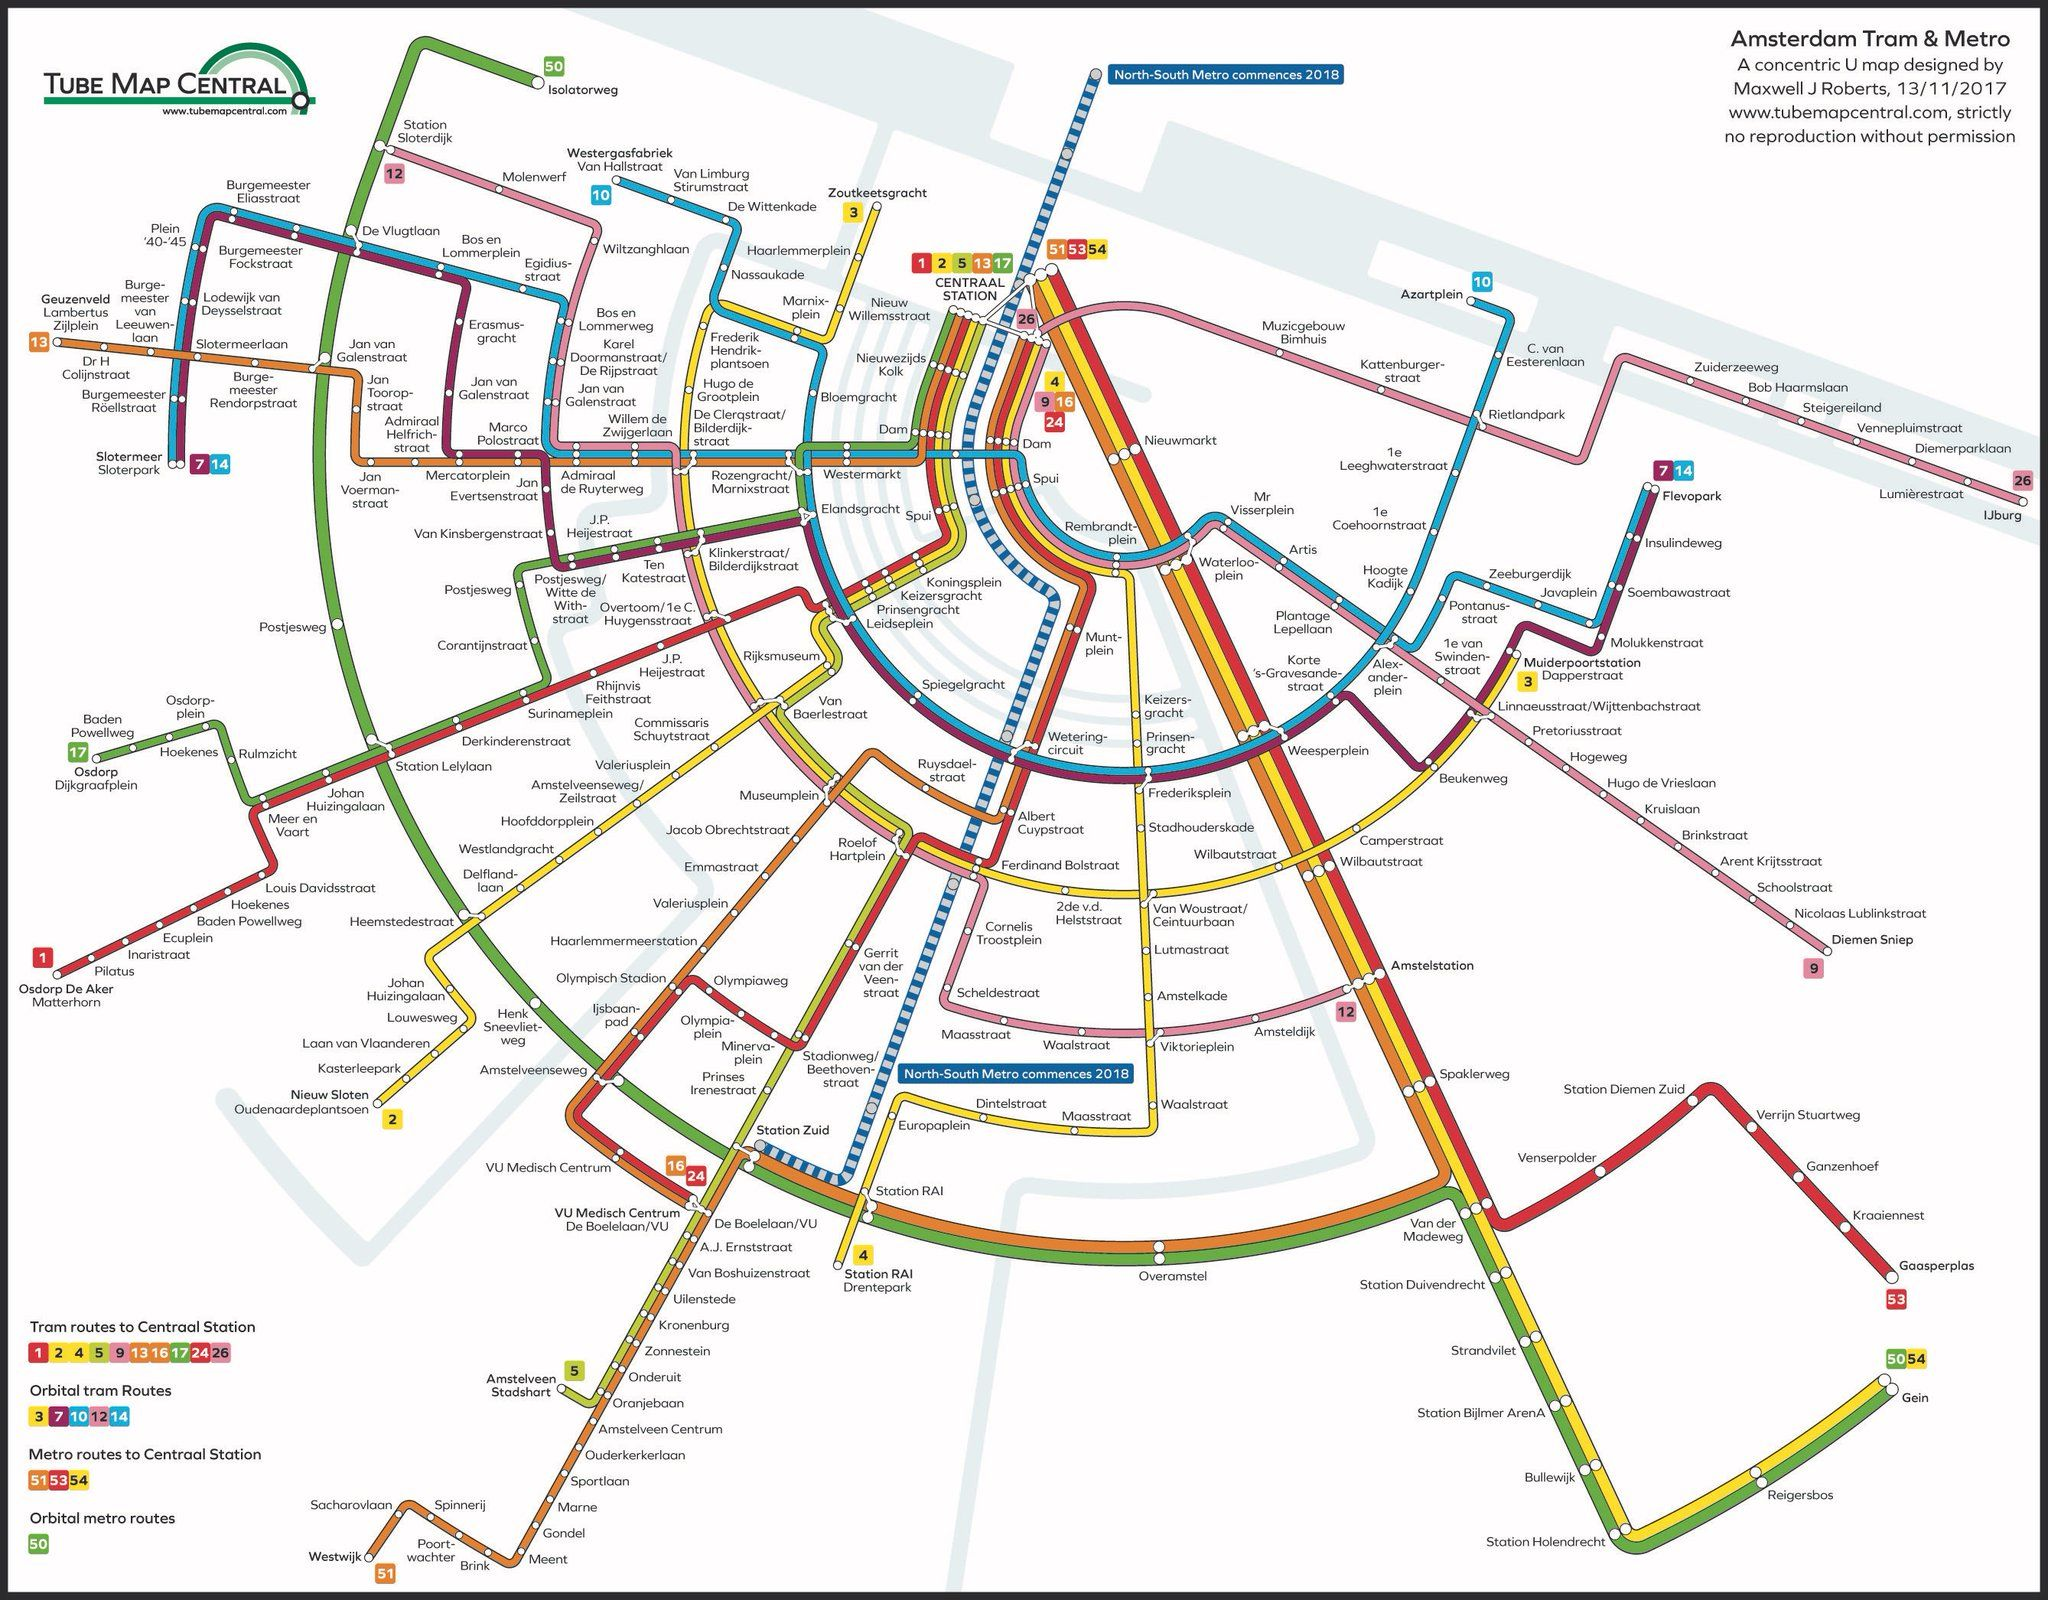 Amsterdam public transport circular map | Map, Amsterdam ... on map of airports in amsterdam, map of hotels in amsterdam, map of coffee shops in amsterdam, map of museums in amsterdam,